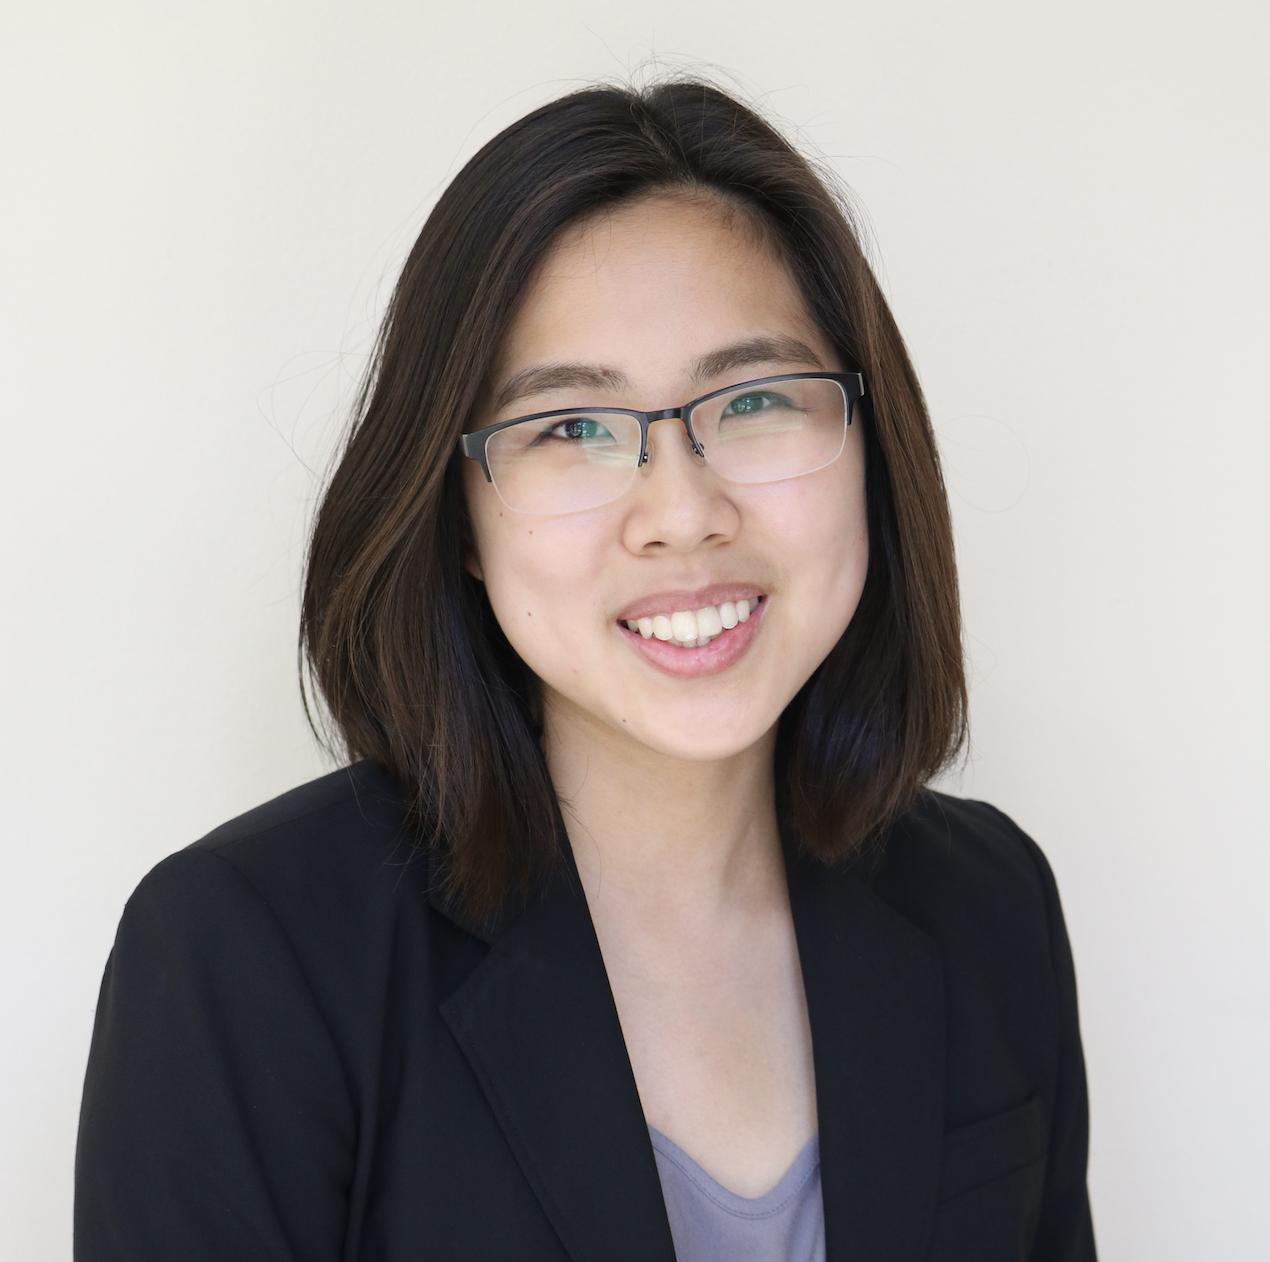 Lauren Chung '20